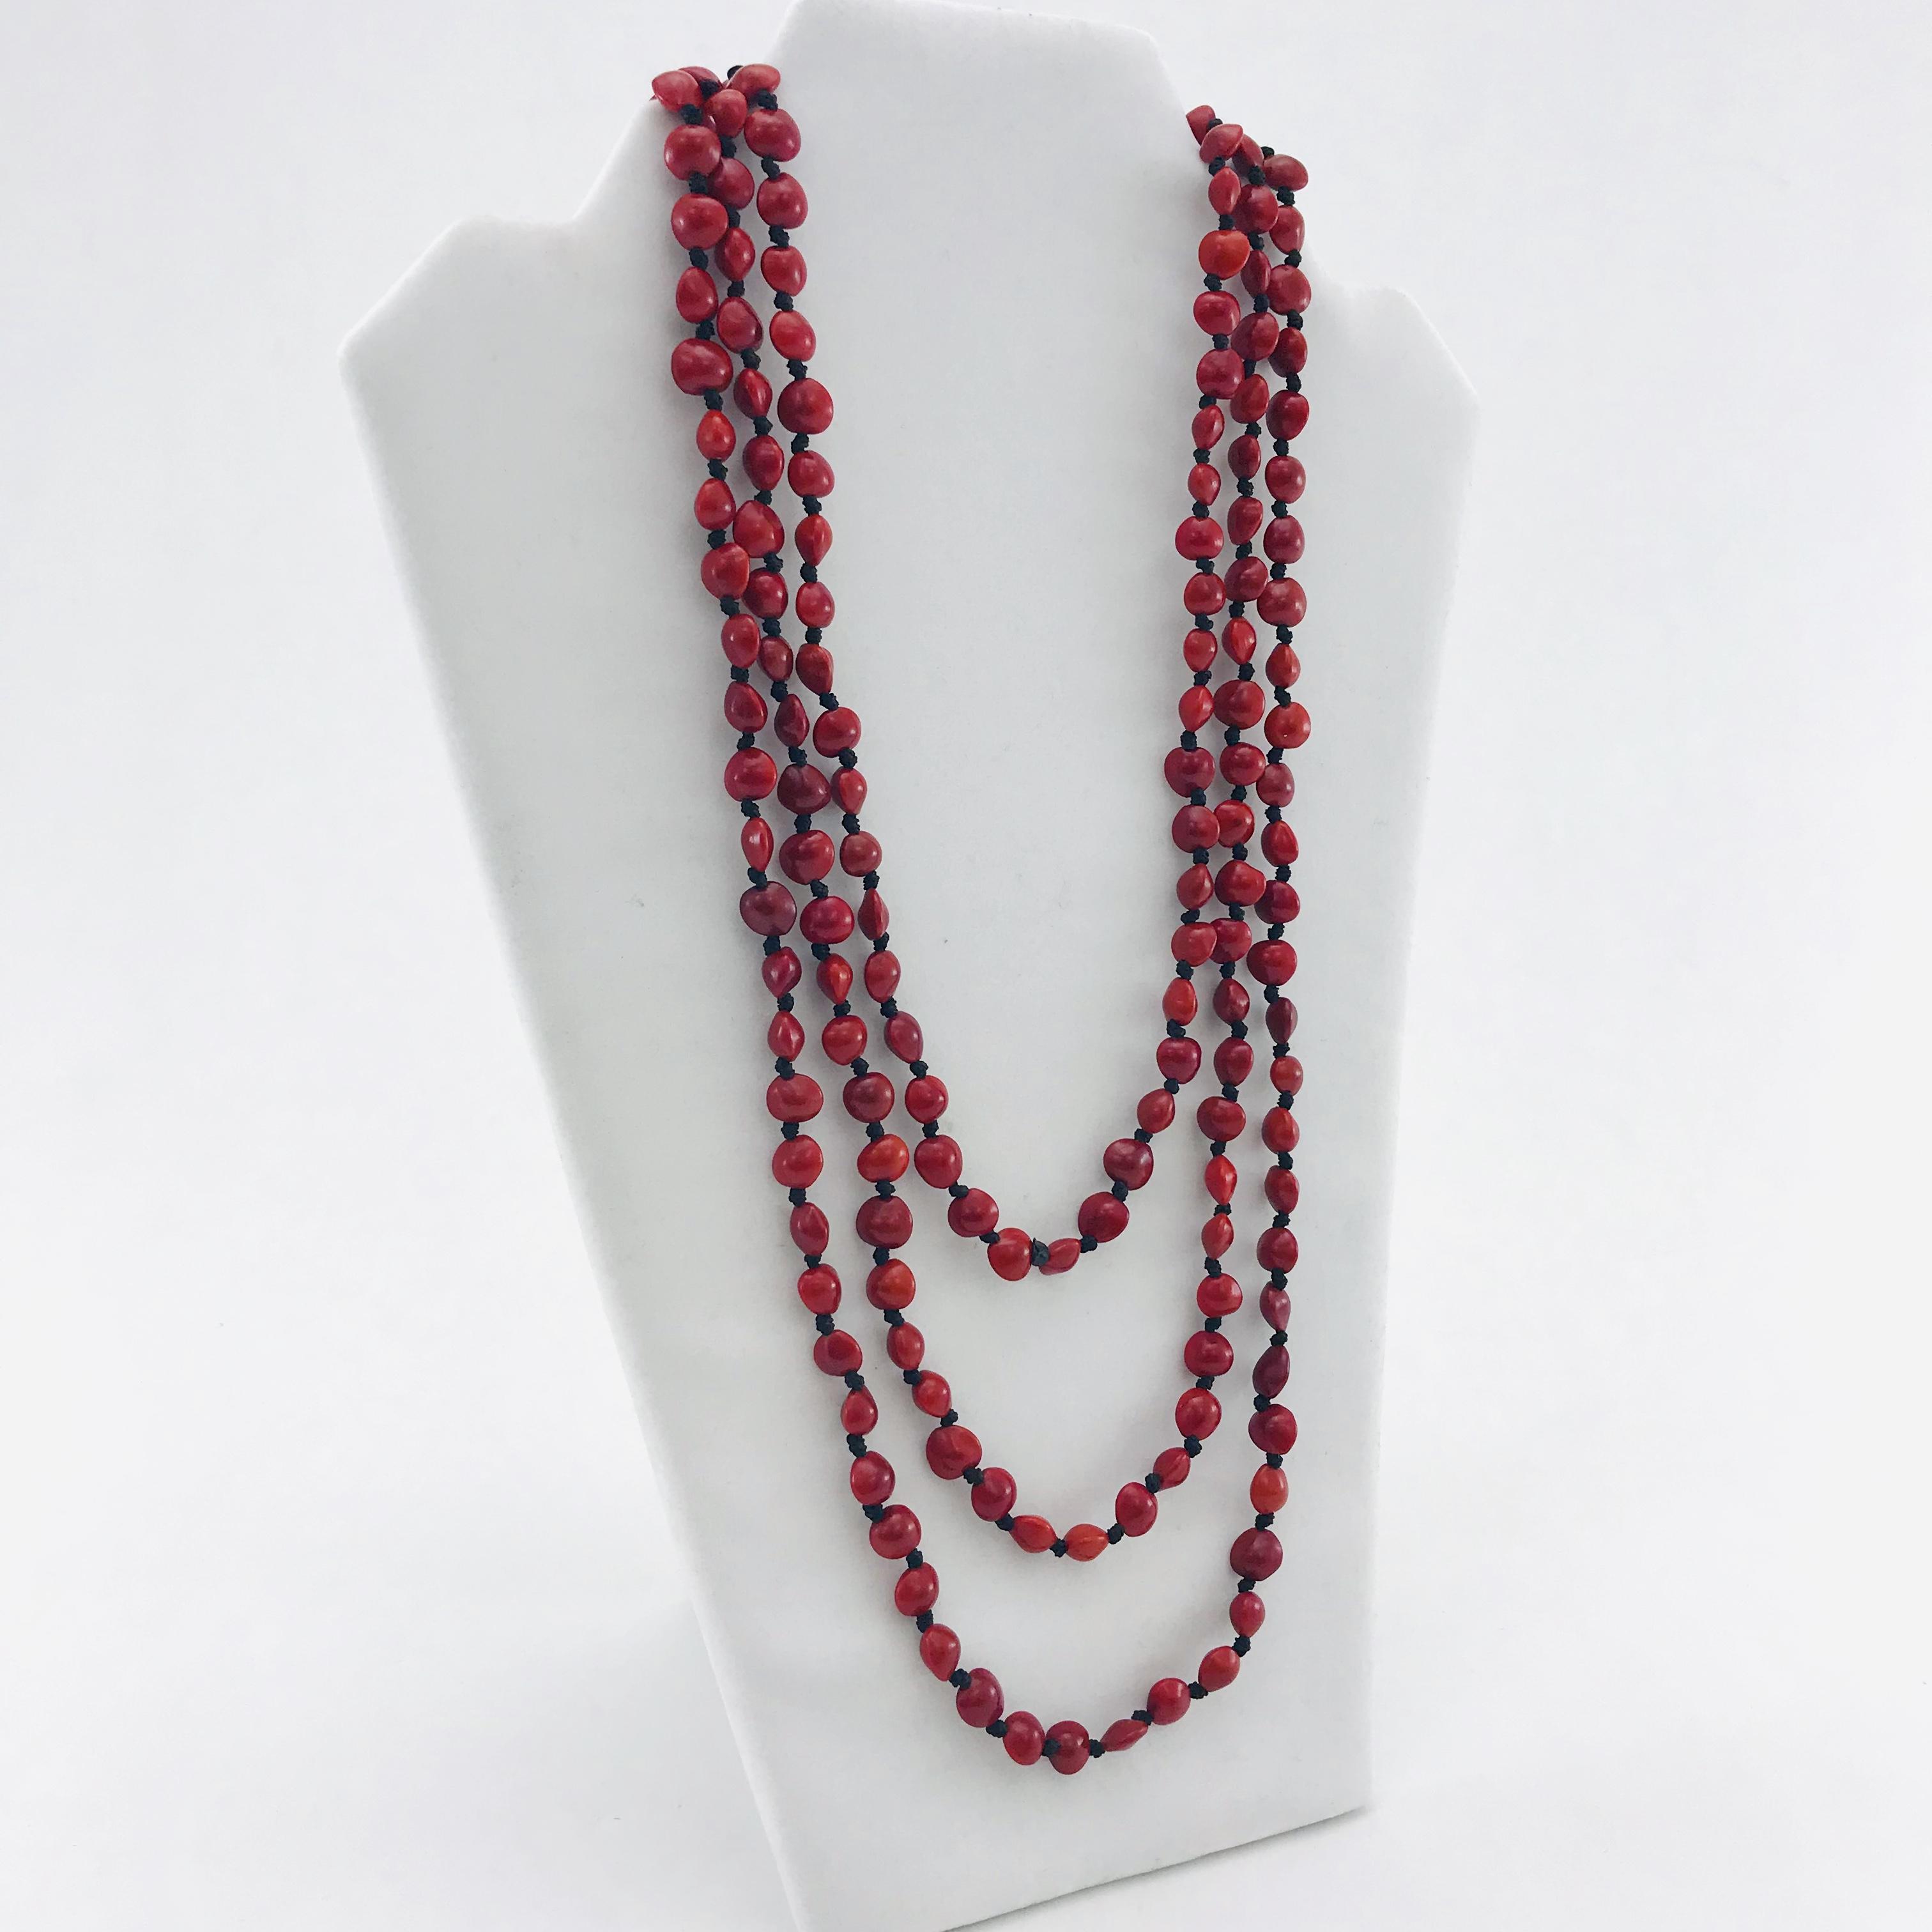 L'infini - Collier graines naturelles - 3 rangs - Rouge